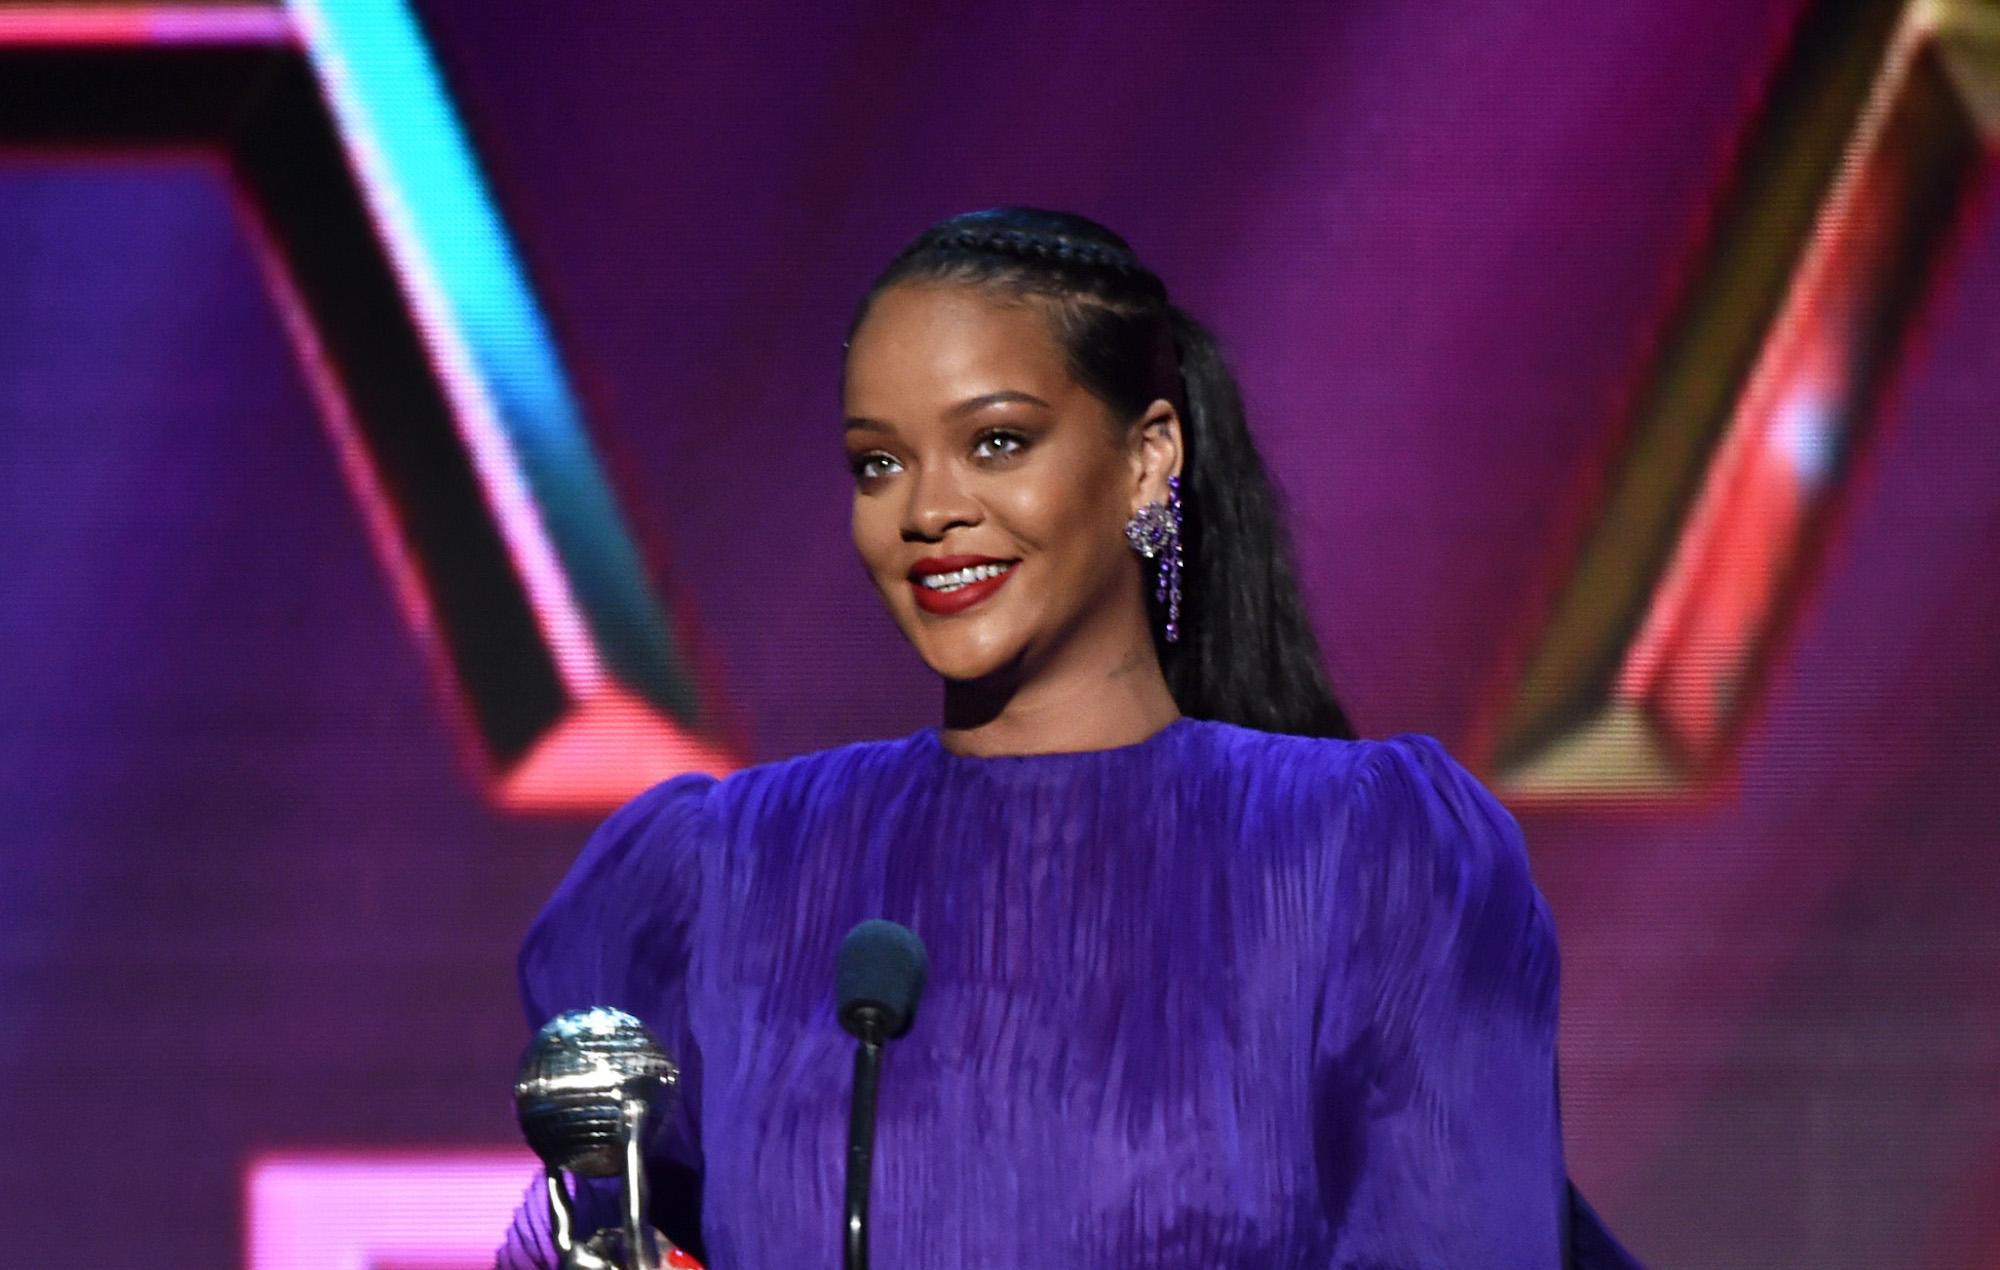 Coronavirus: Rihanna offers to buy $700k worth of ventilators for Barbados - EpicNews